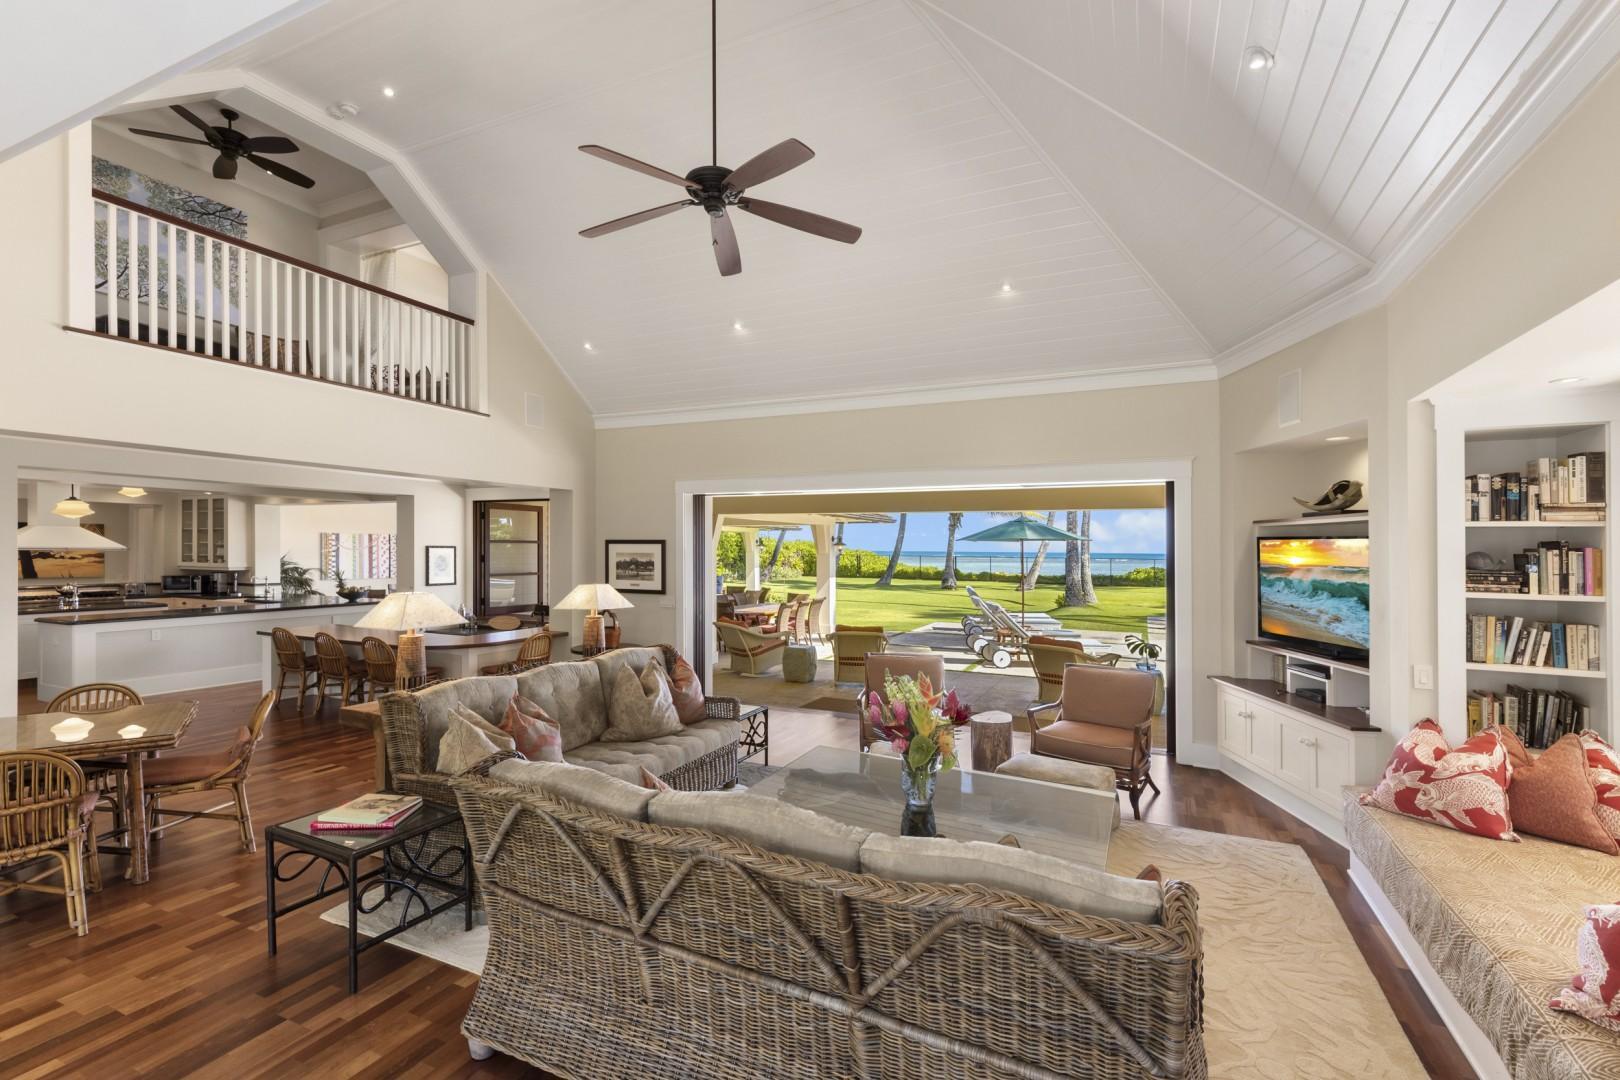 Living room area, looking makai (toward the ocean)